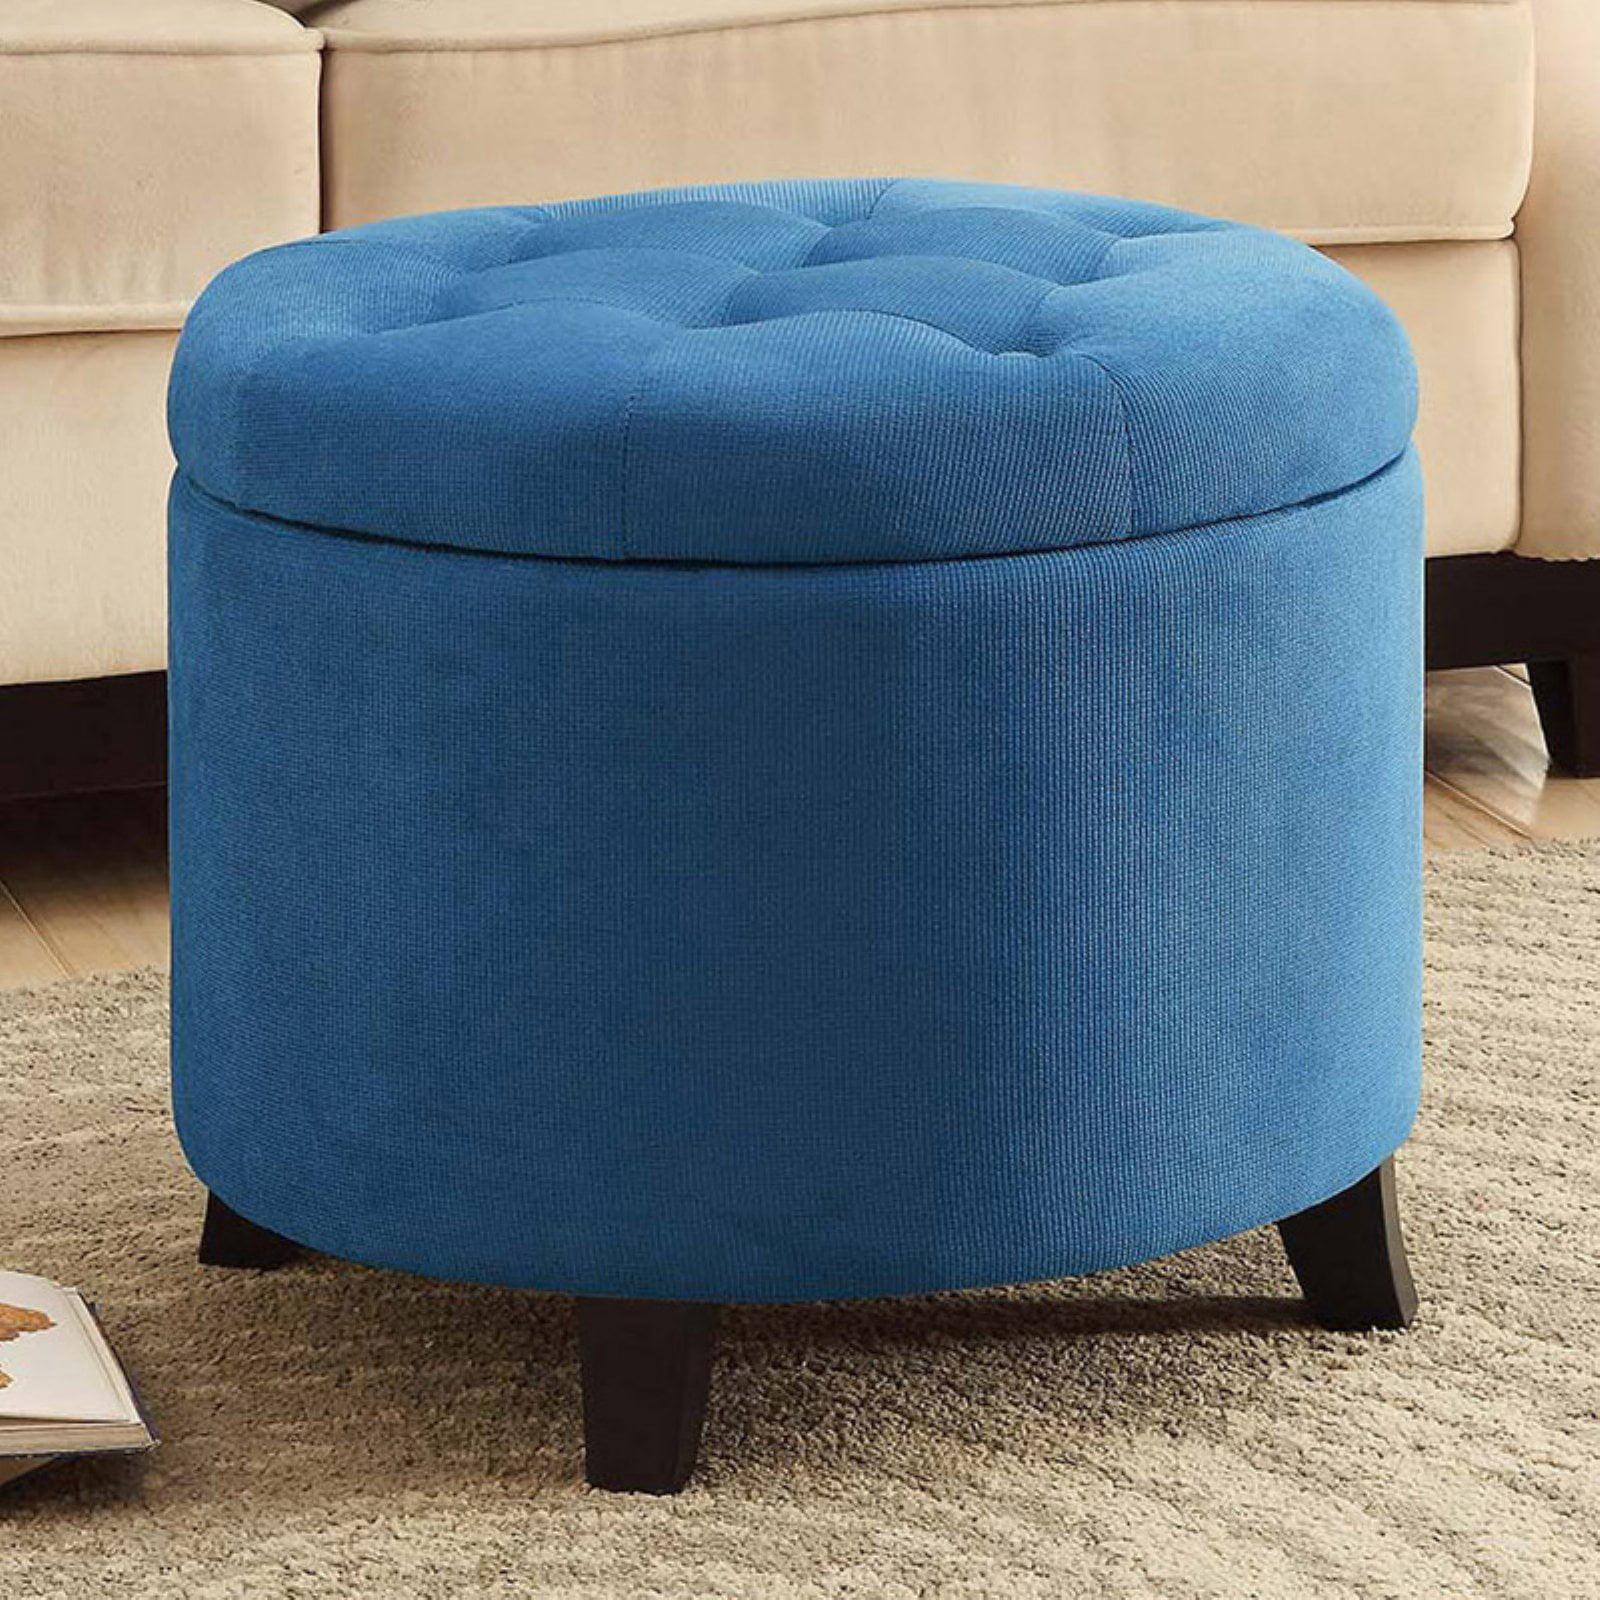 Convenience Concepts Designs4Comfort Round Ottoman, Multiple Colors